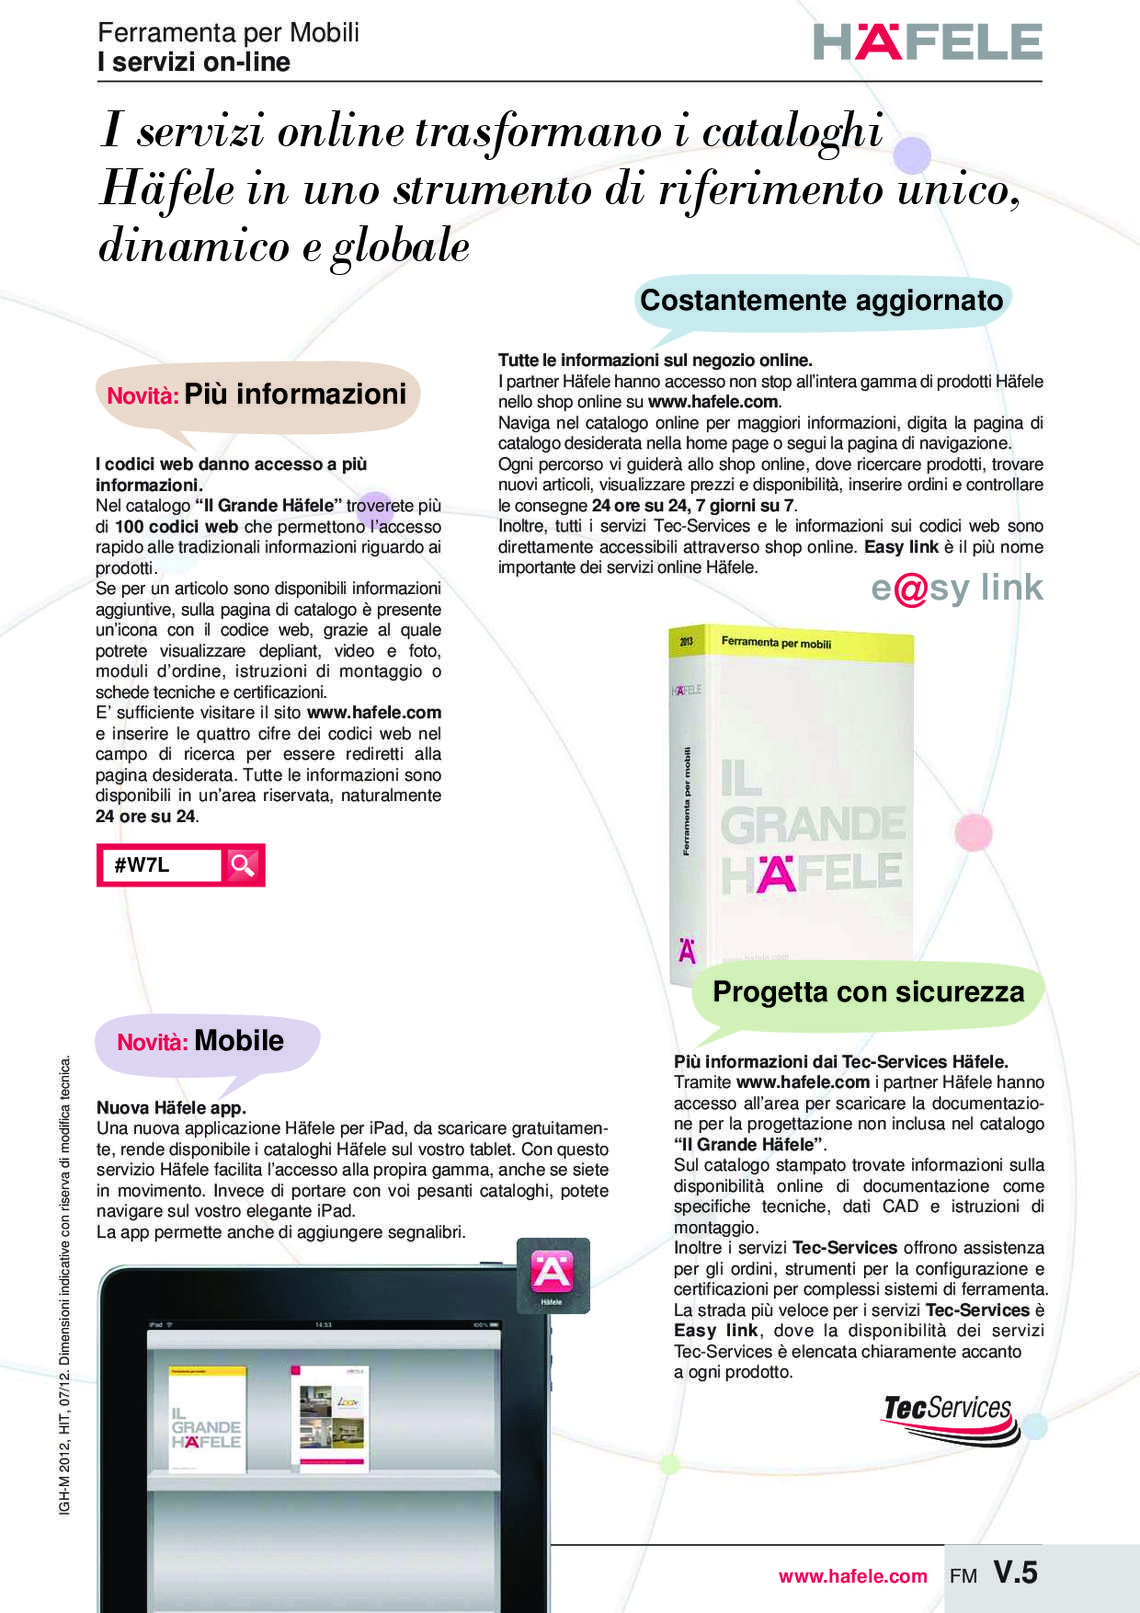 hafele-spondine-e-guide-per-mobili_40_006.jpg